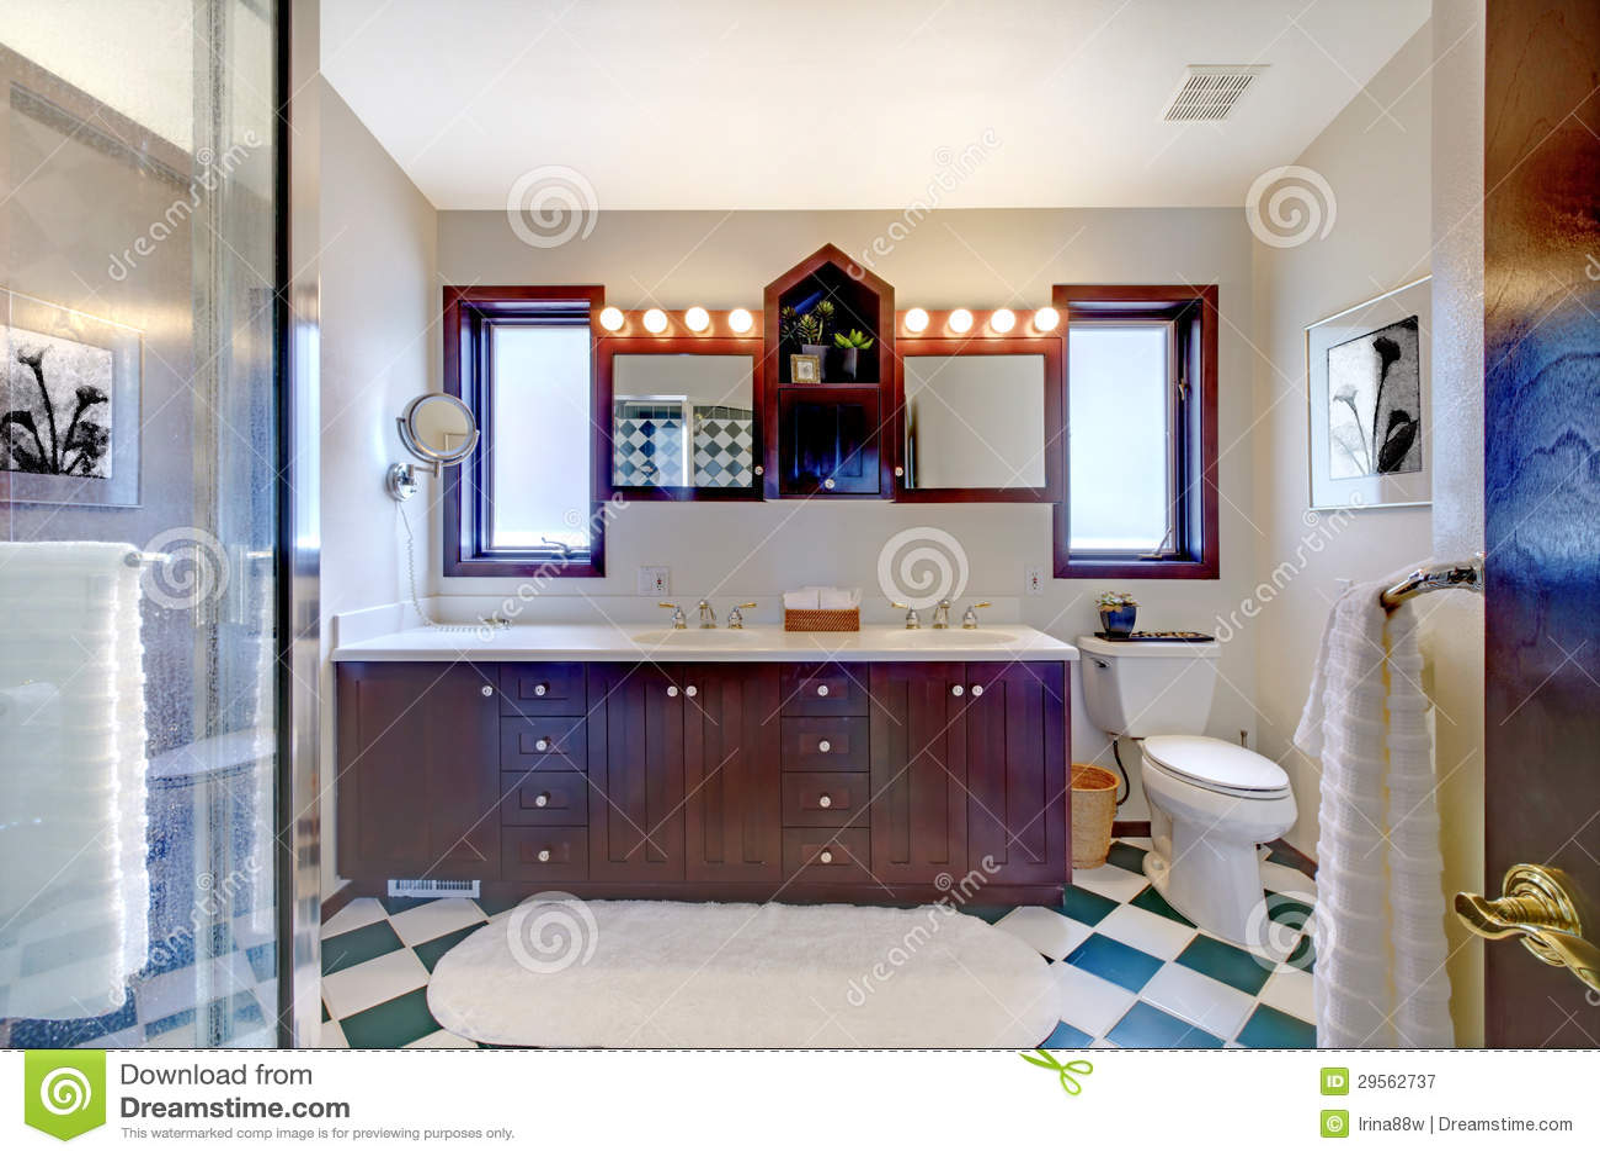 Badkamer tegels hout: badkamer tegels hout.